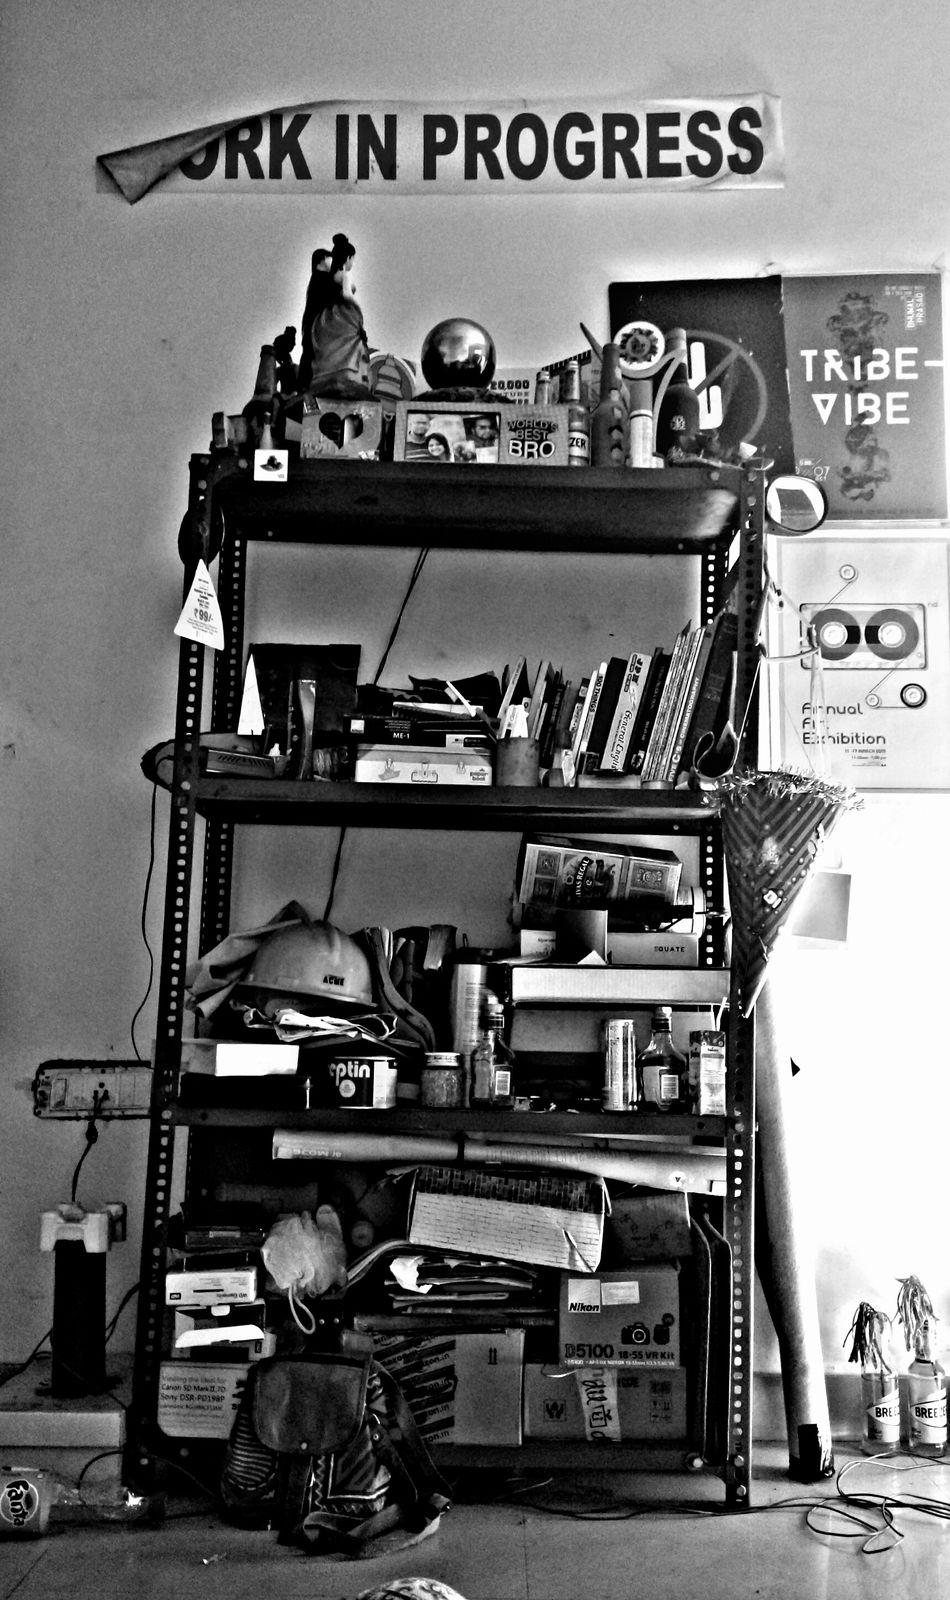 Work in progress... Blackandwhite Shelf Showcase March Life Busy ChillTimes